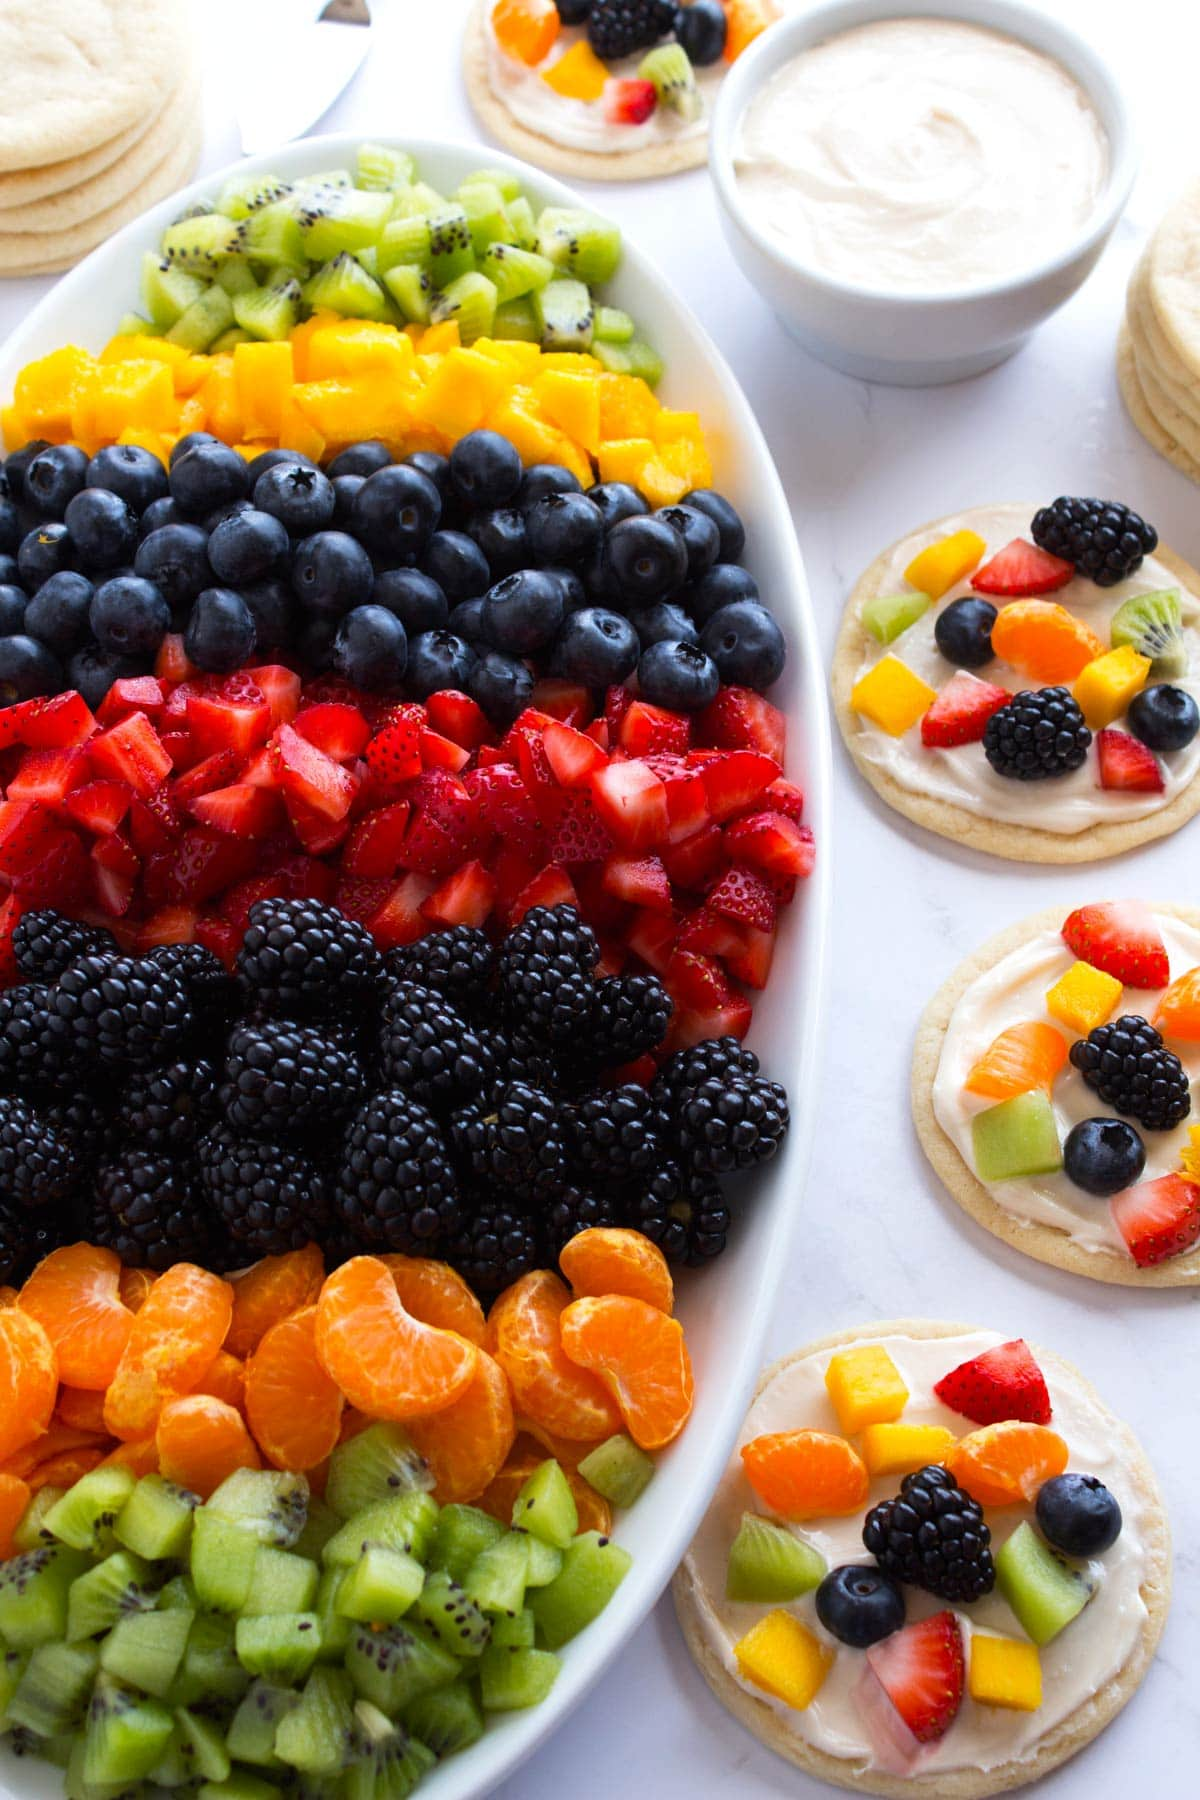 Fruit platter and mini fruit pizzas.